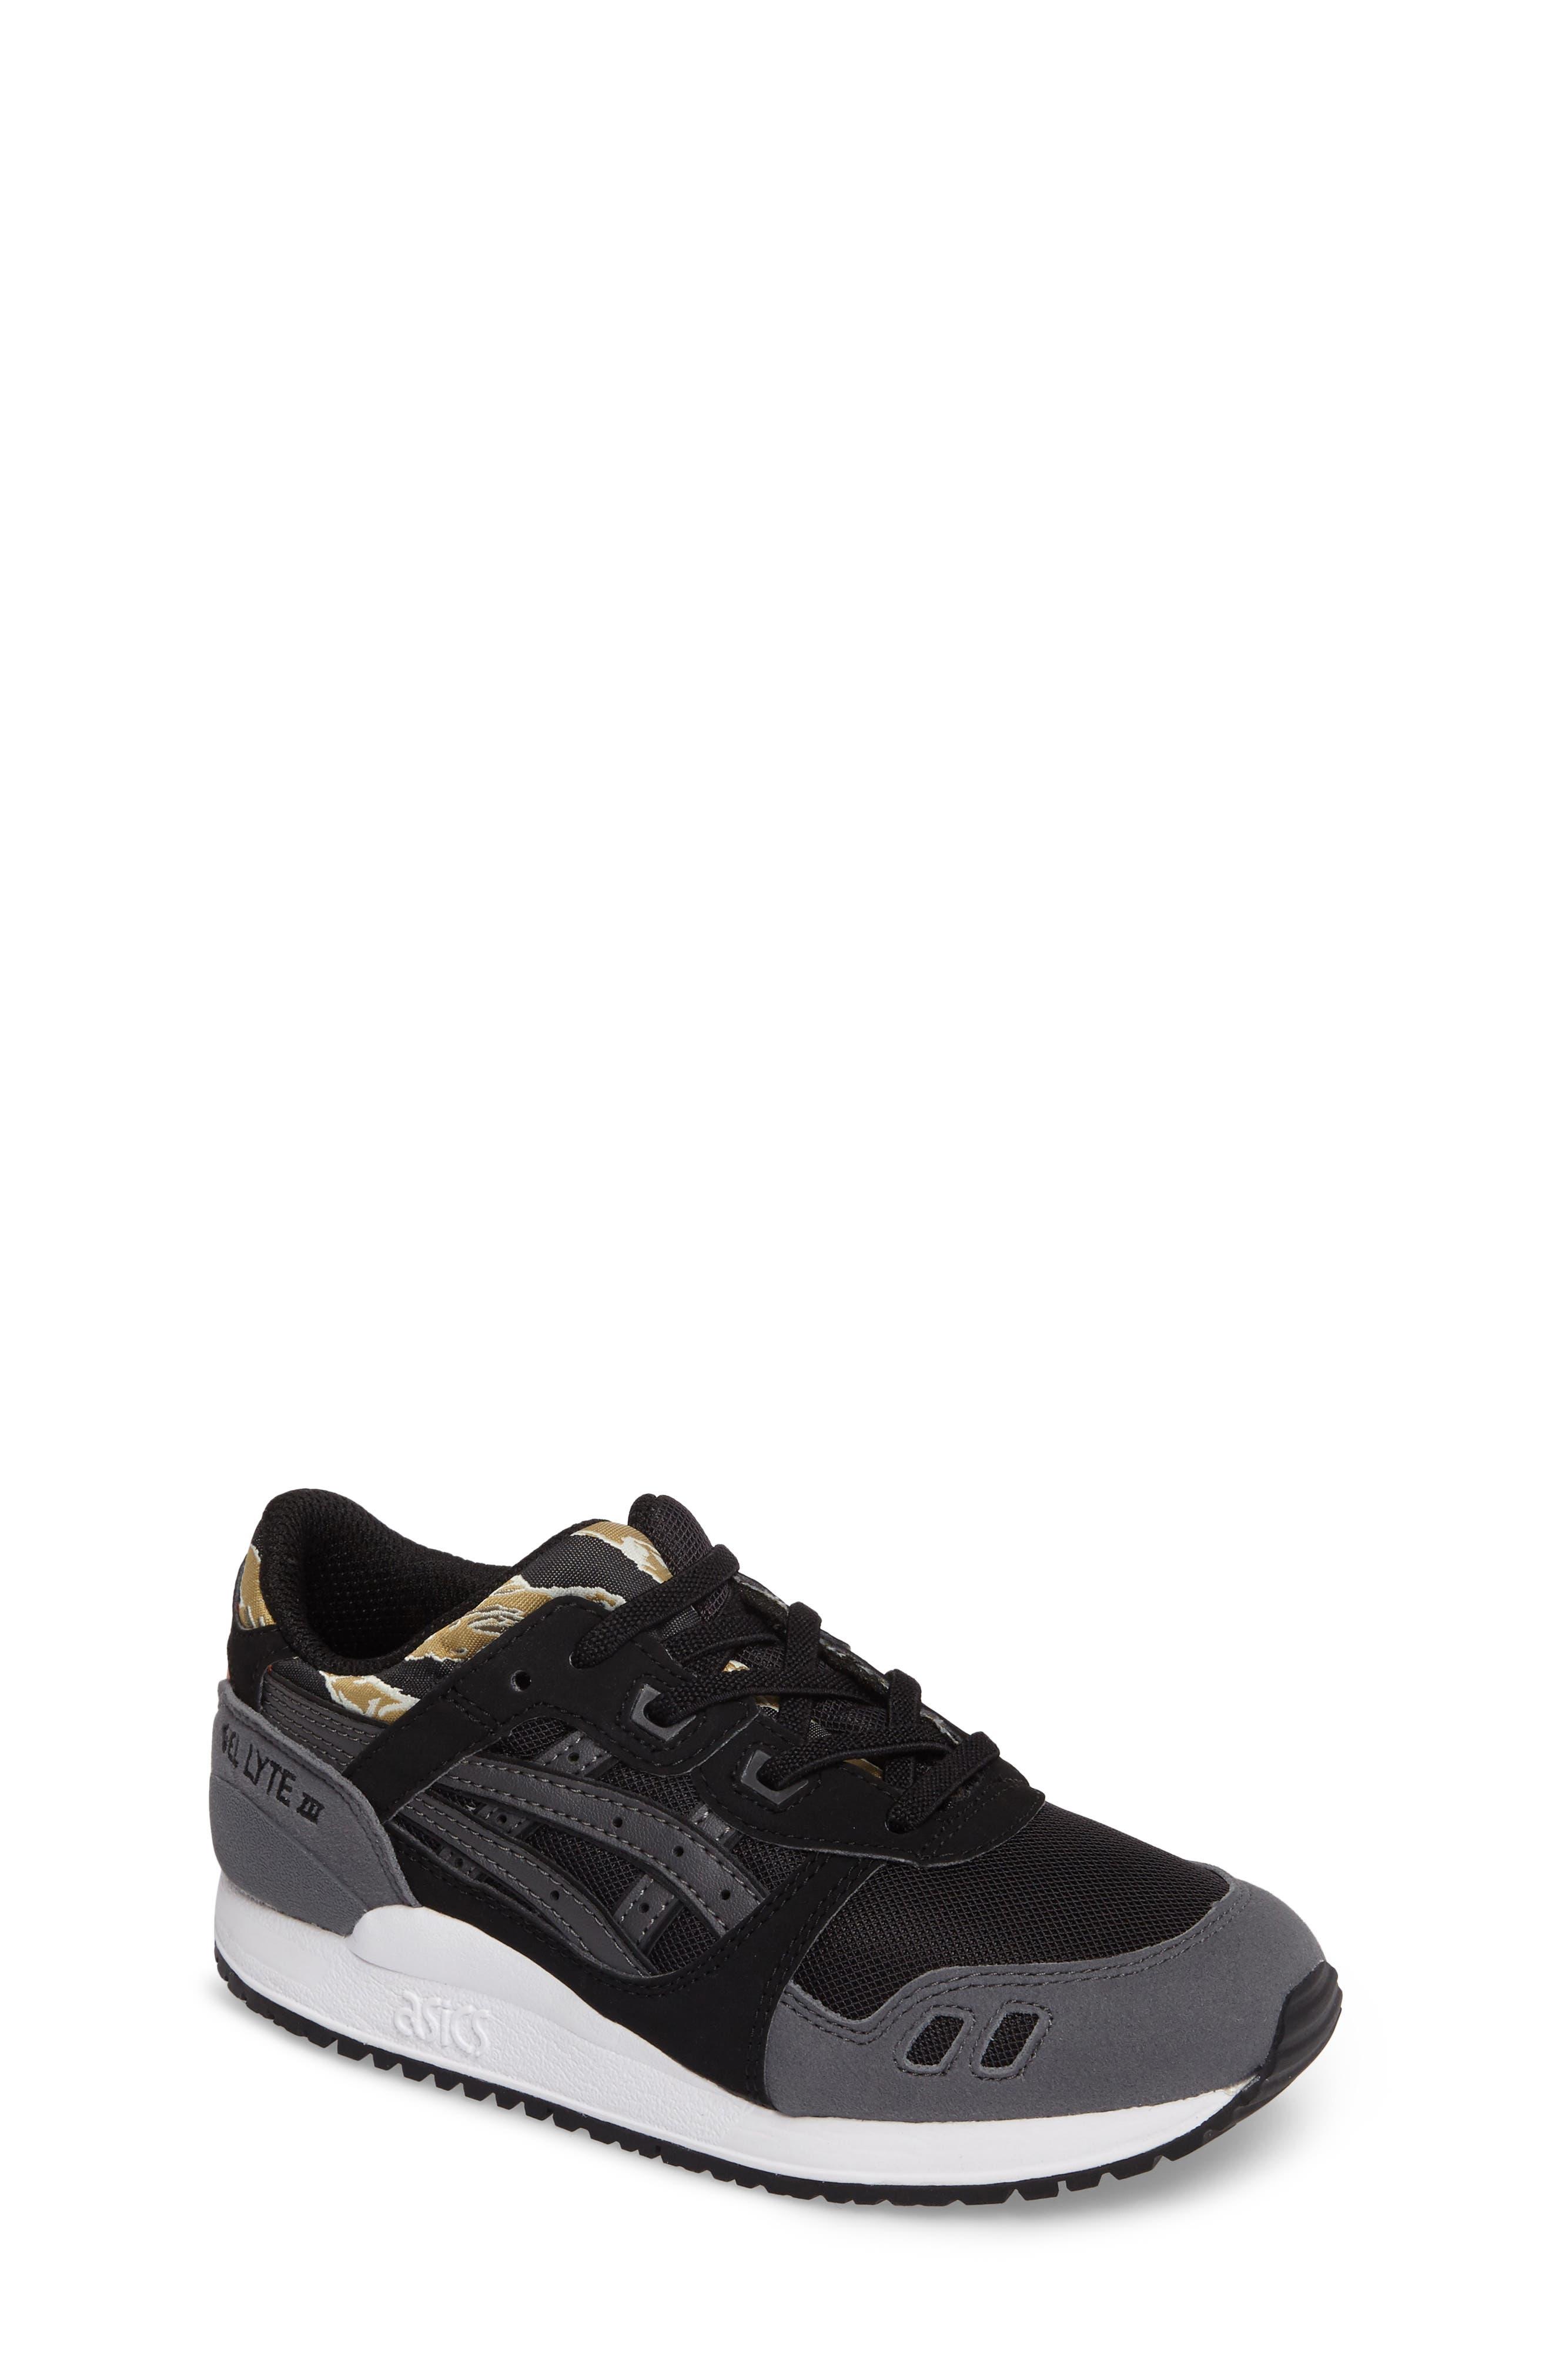 GEL-LYTE<sup>®</sup> III PS Slip-On Sneaker,                             Main thumbnail 1, color,                             001